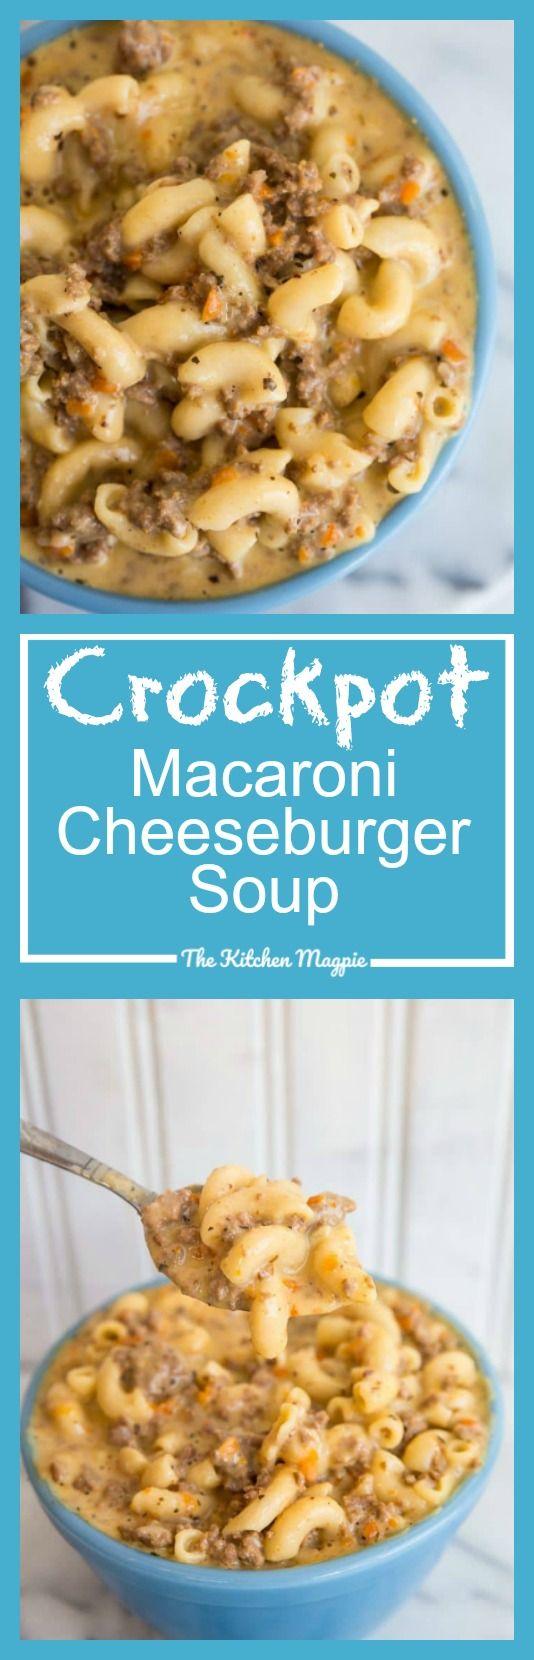 Crockpot Macaroni Cheeseburger Soup - The Kitchen Magpie